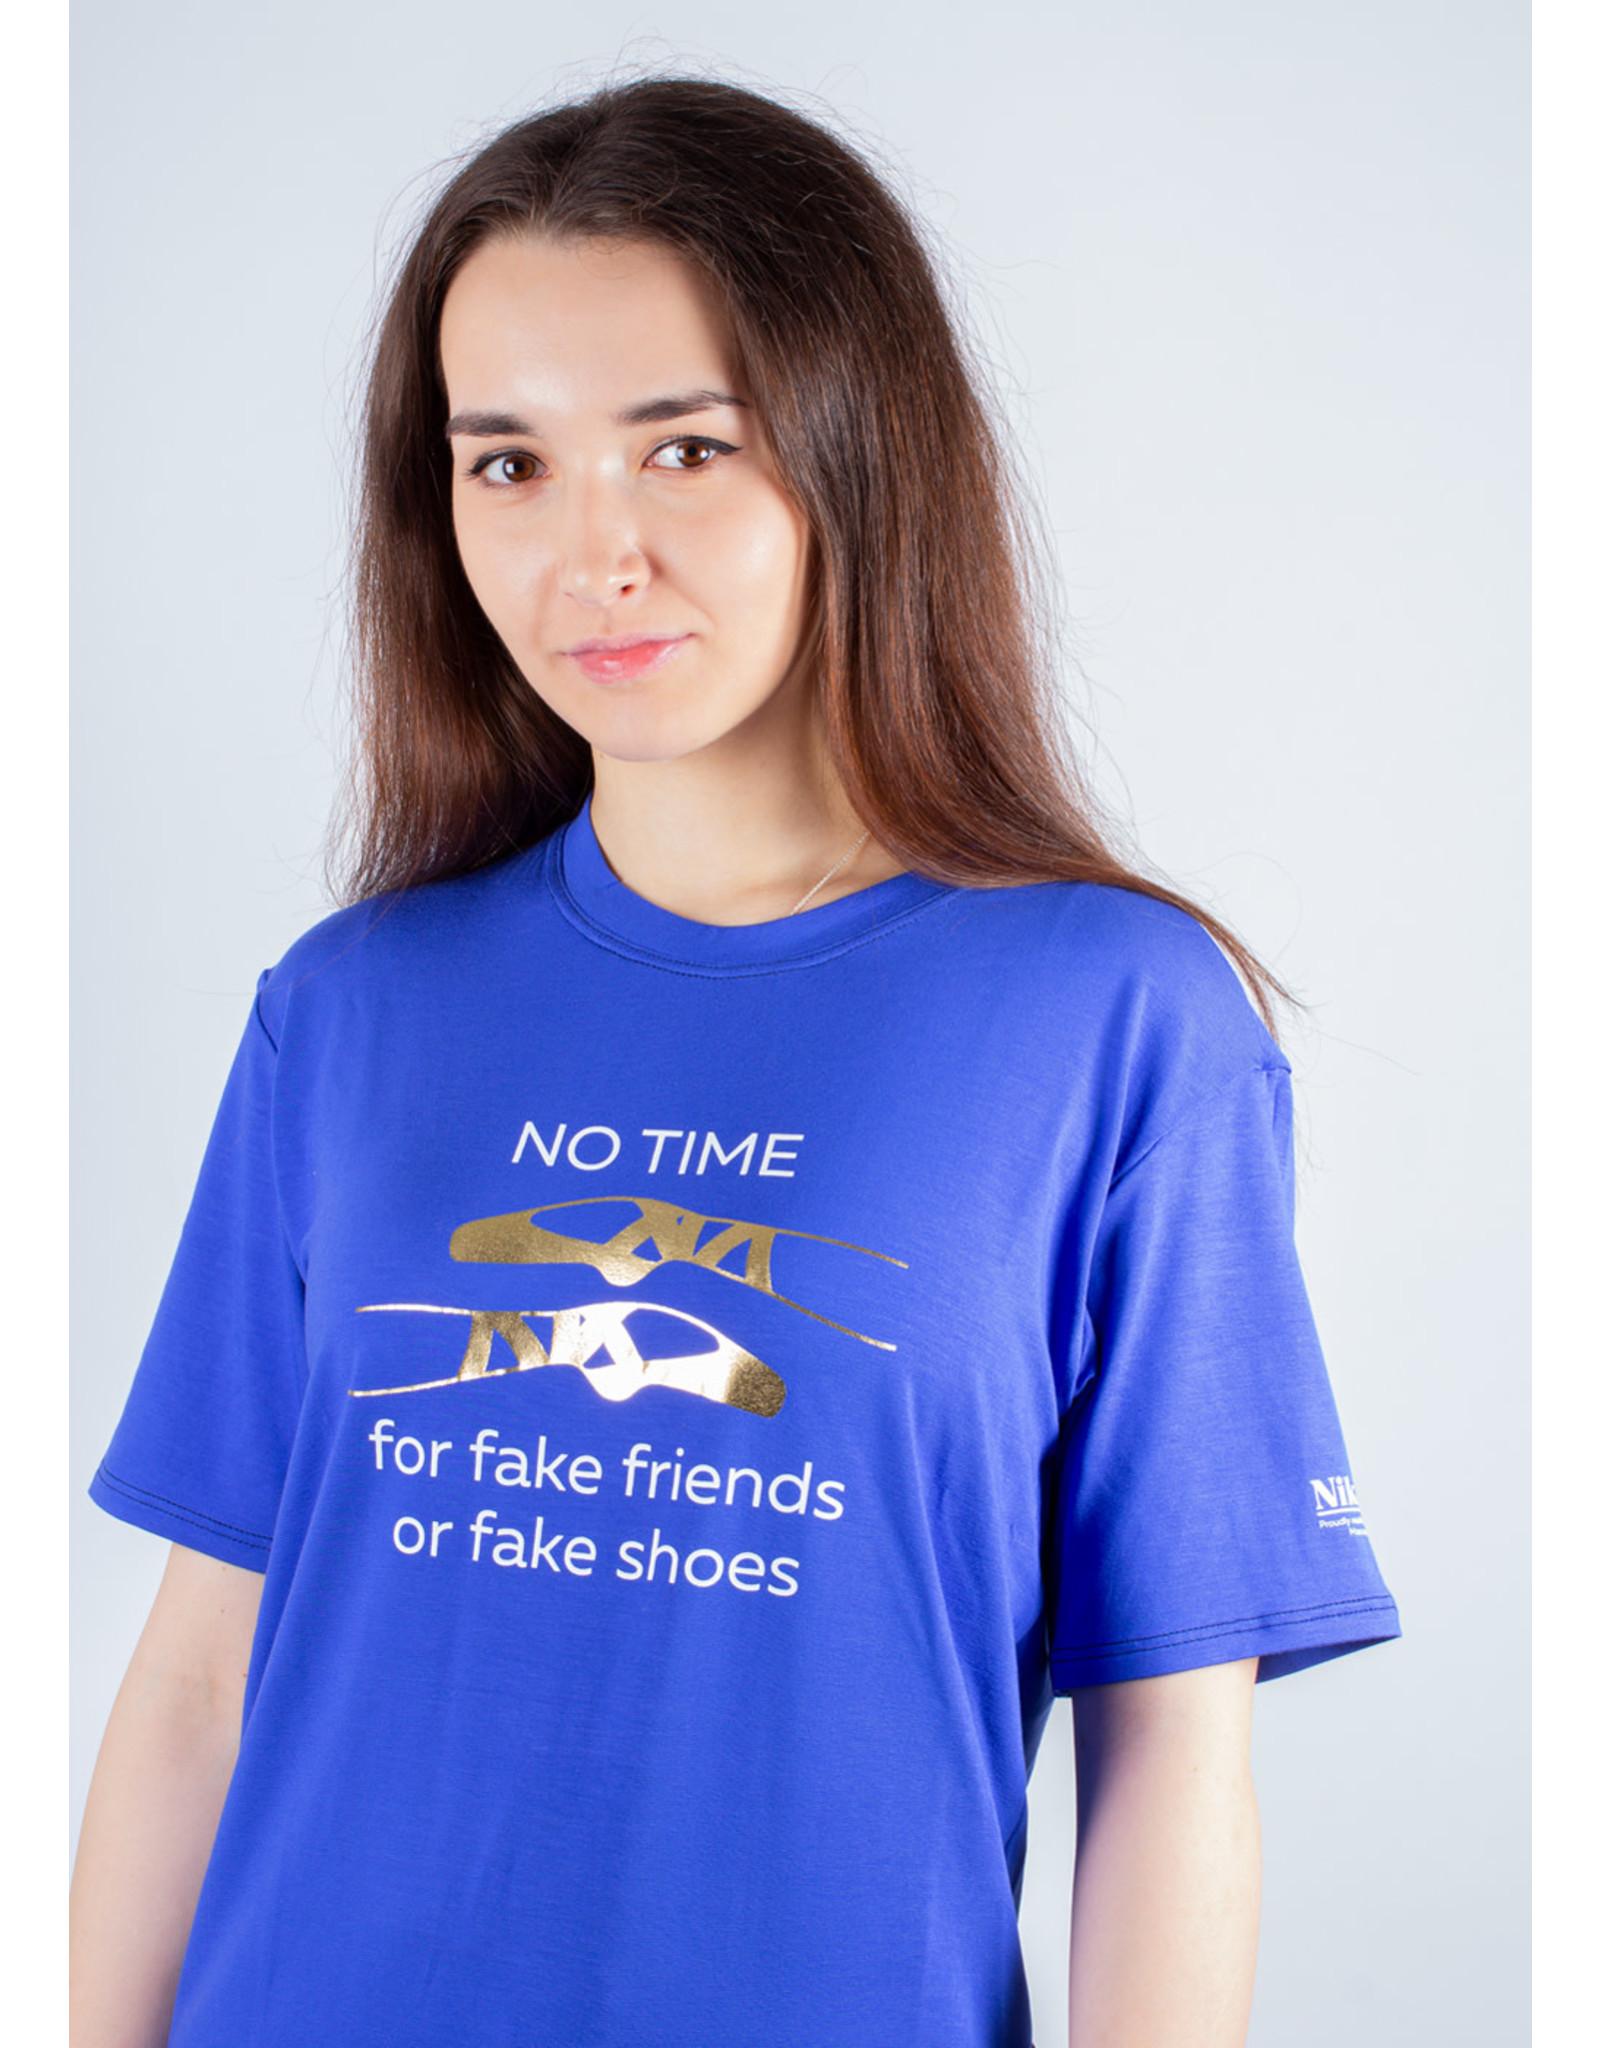 Nikolay Nikolay T-shirt